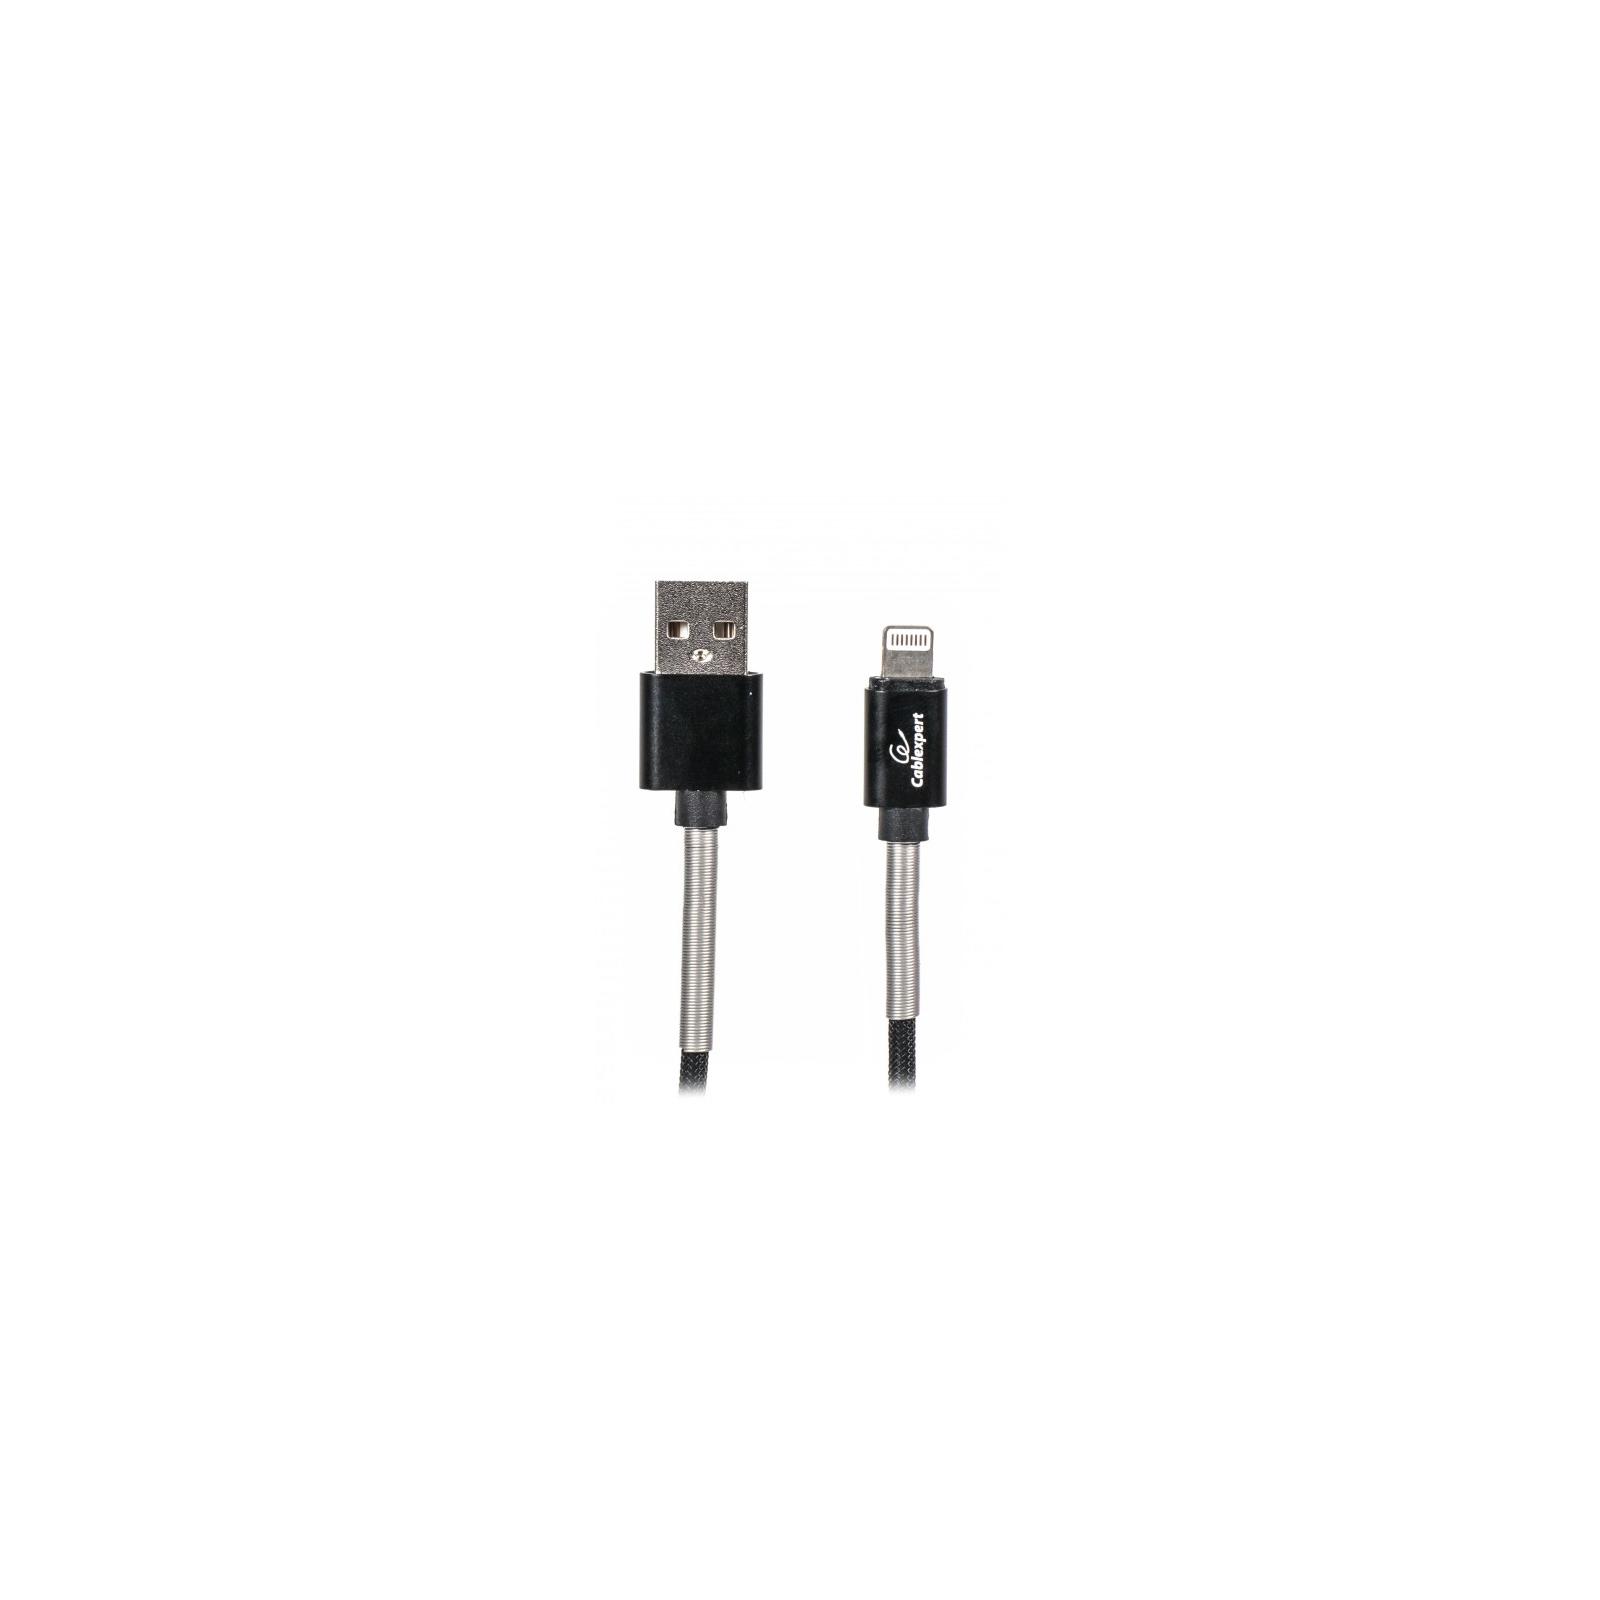 Дата кабель USB 2.0 AM to Lightning 1.0m Cablexpert (CCPB-L-USB-06BK)